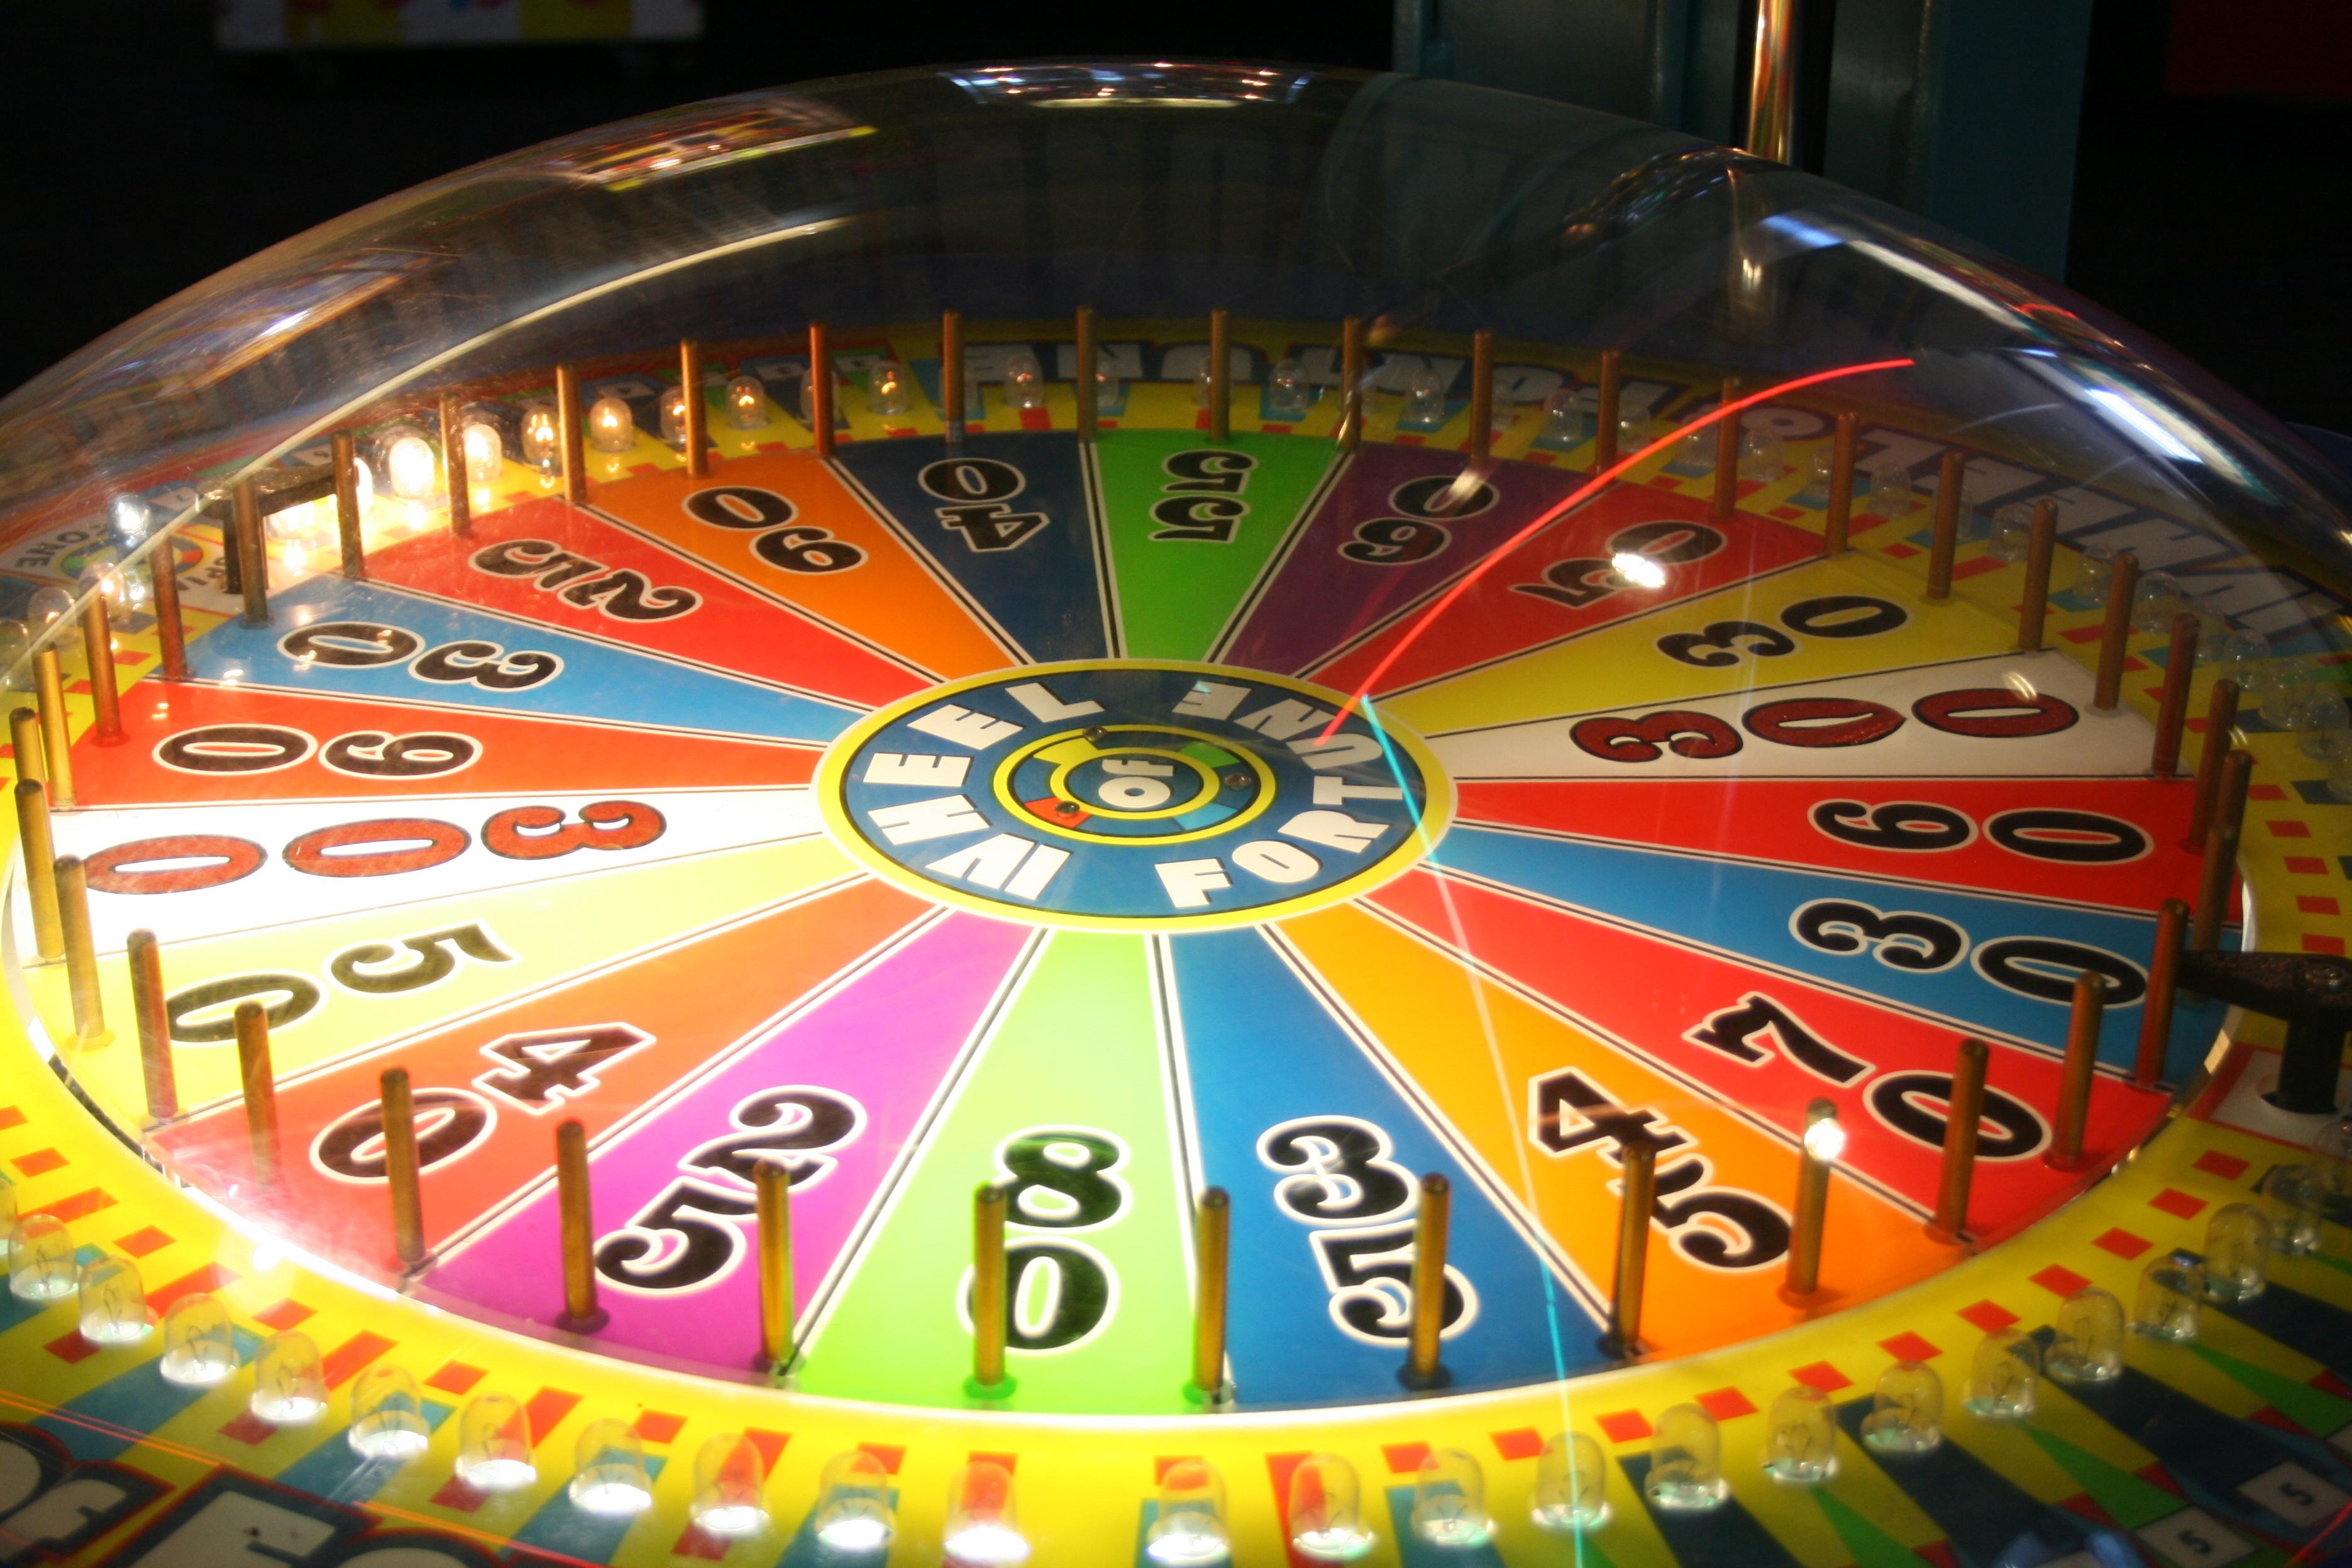 File:Wheel of Fortune Cyclone Arcade Game.jpg - Wikimedia Commons